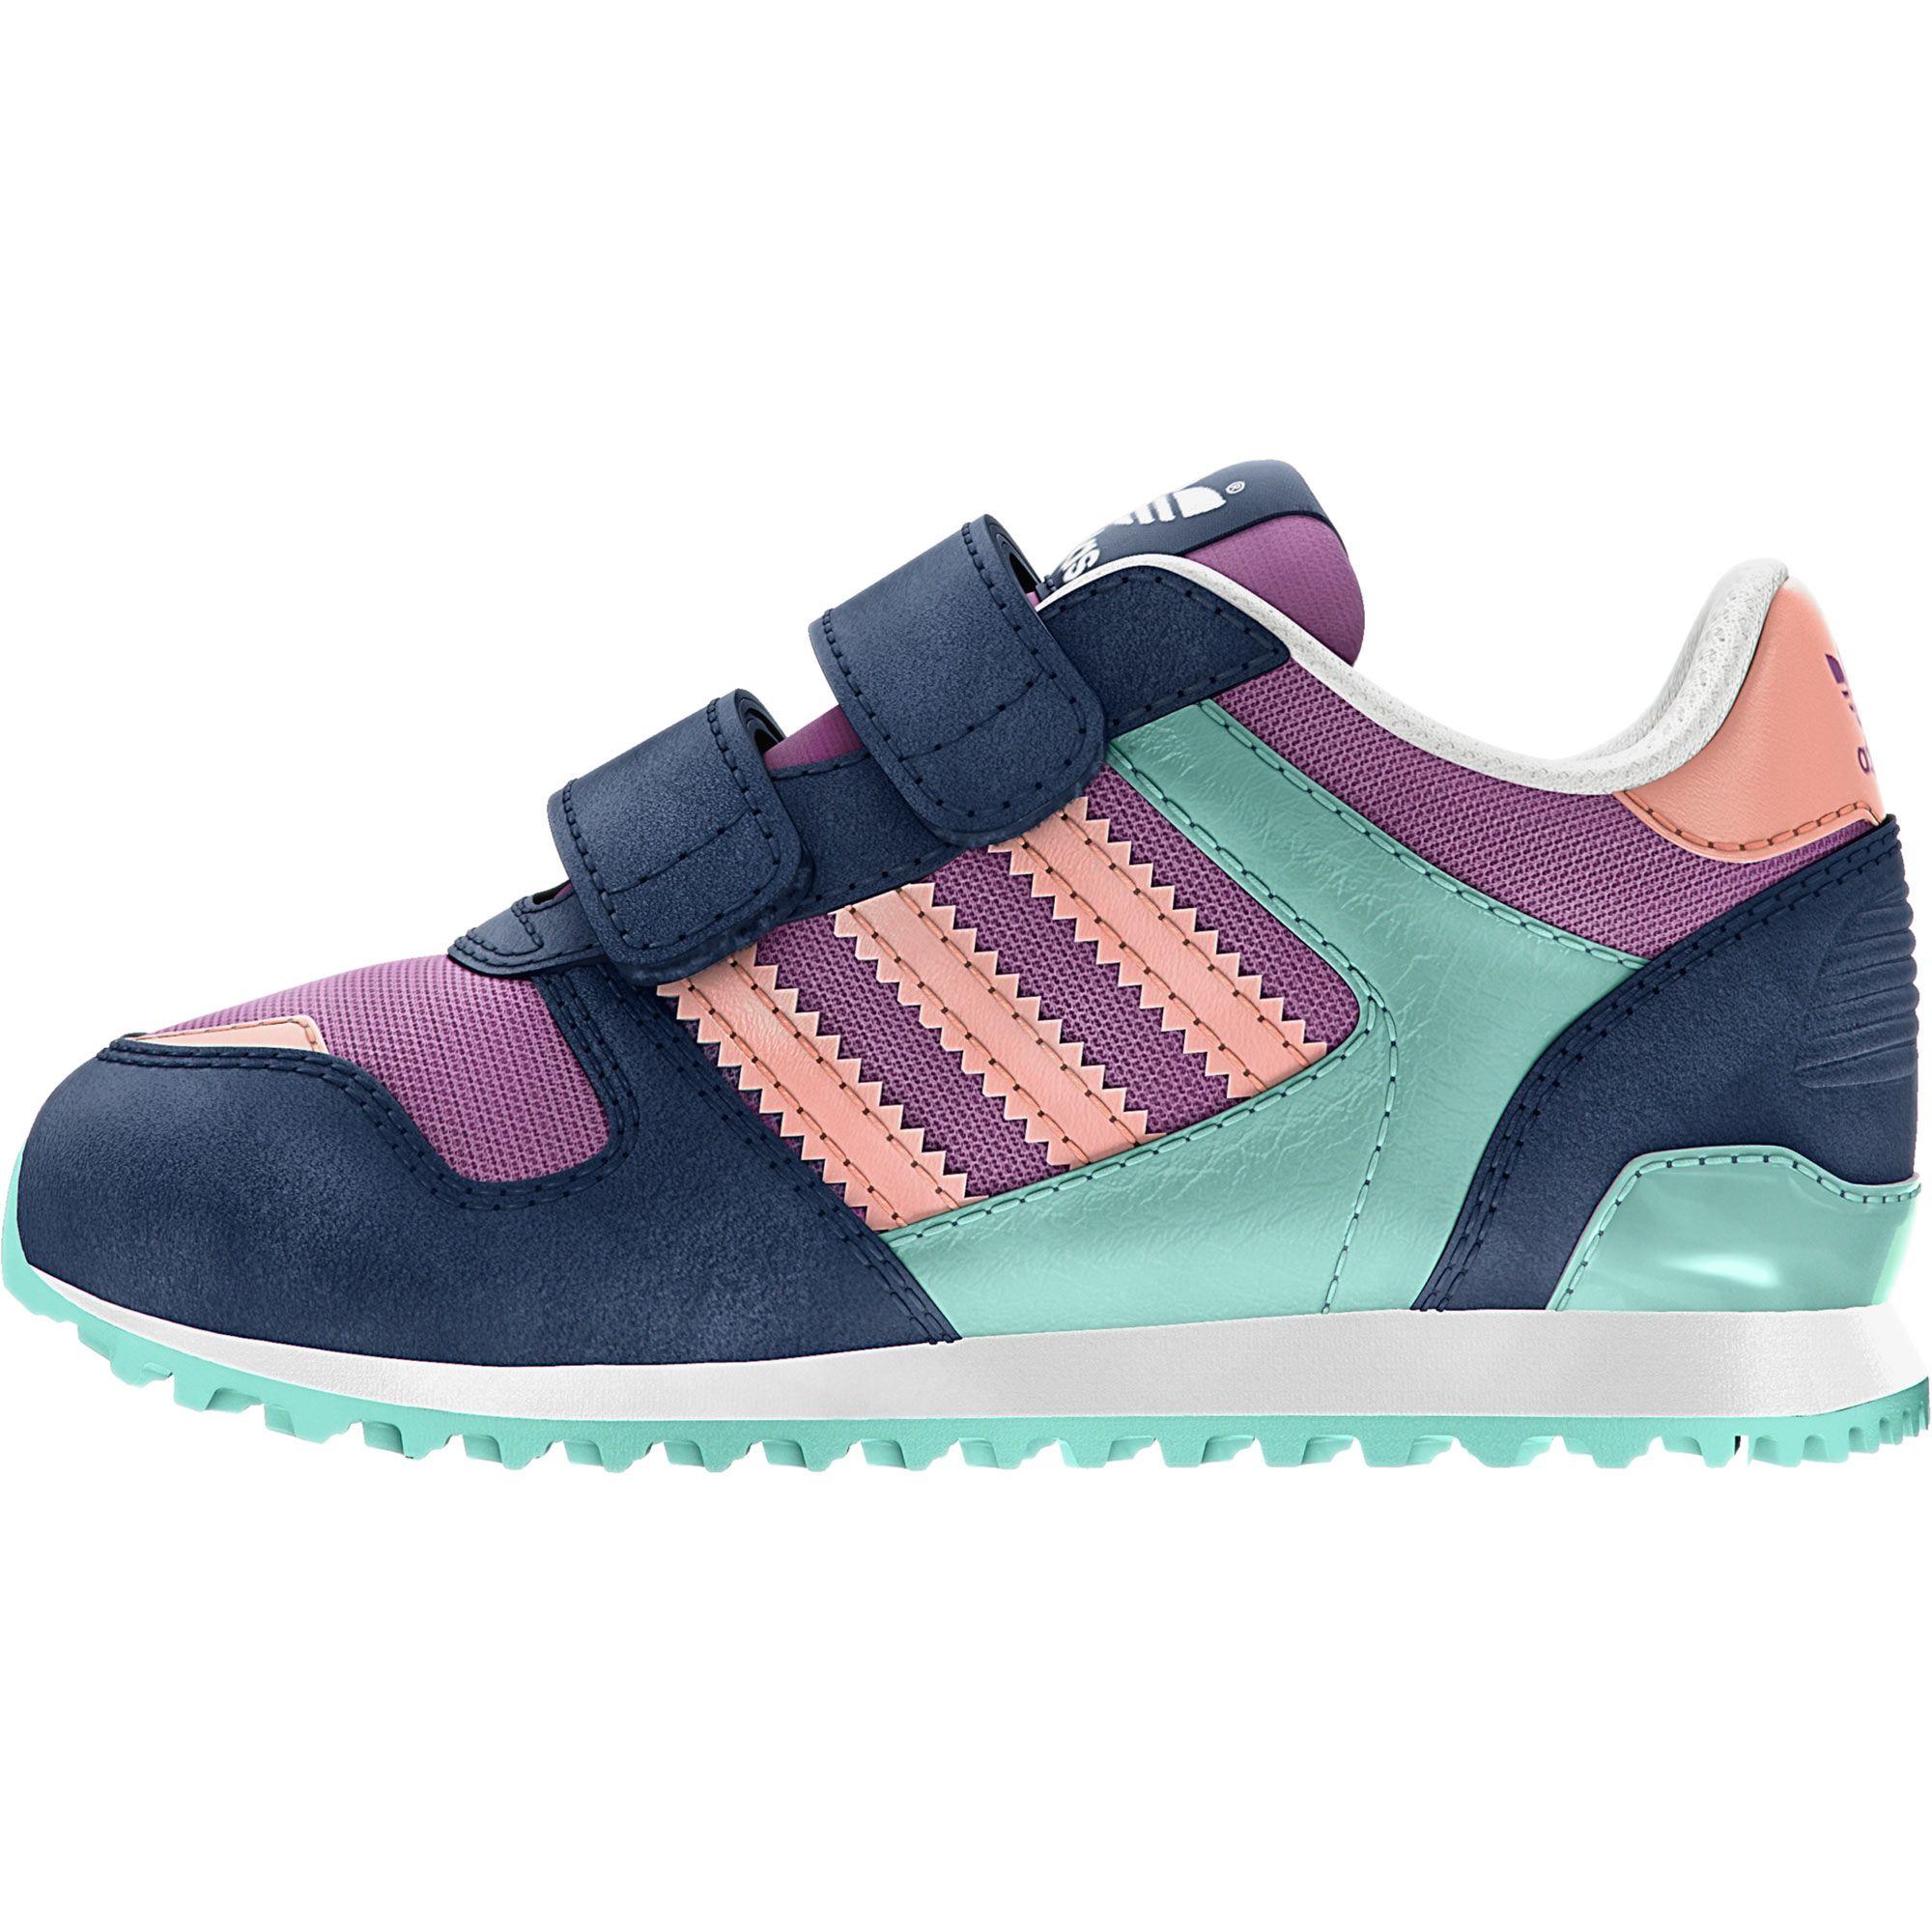 Kids Adidas Originals Zx 700 Shoes